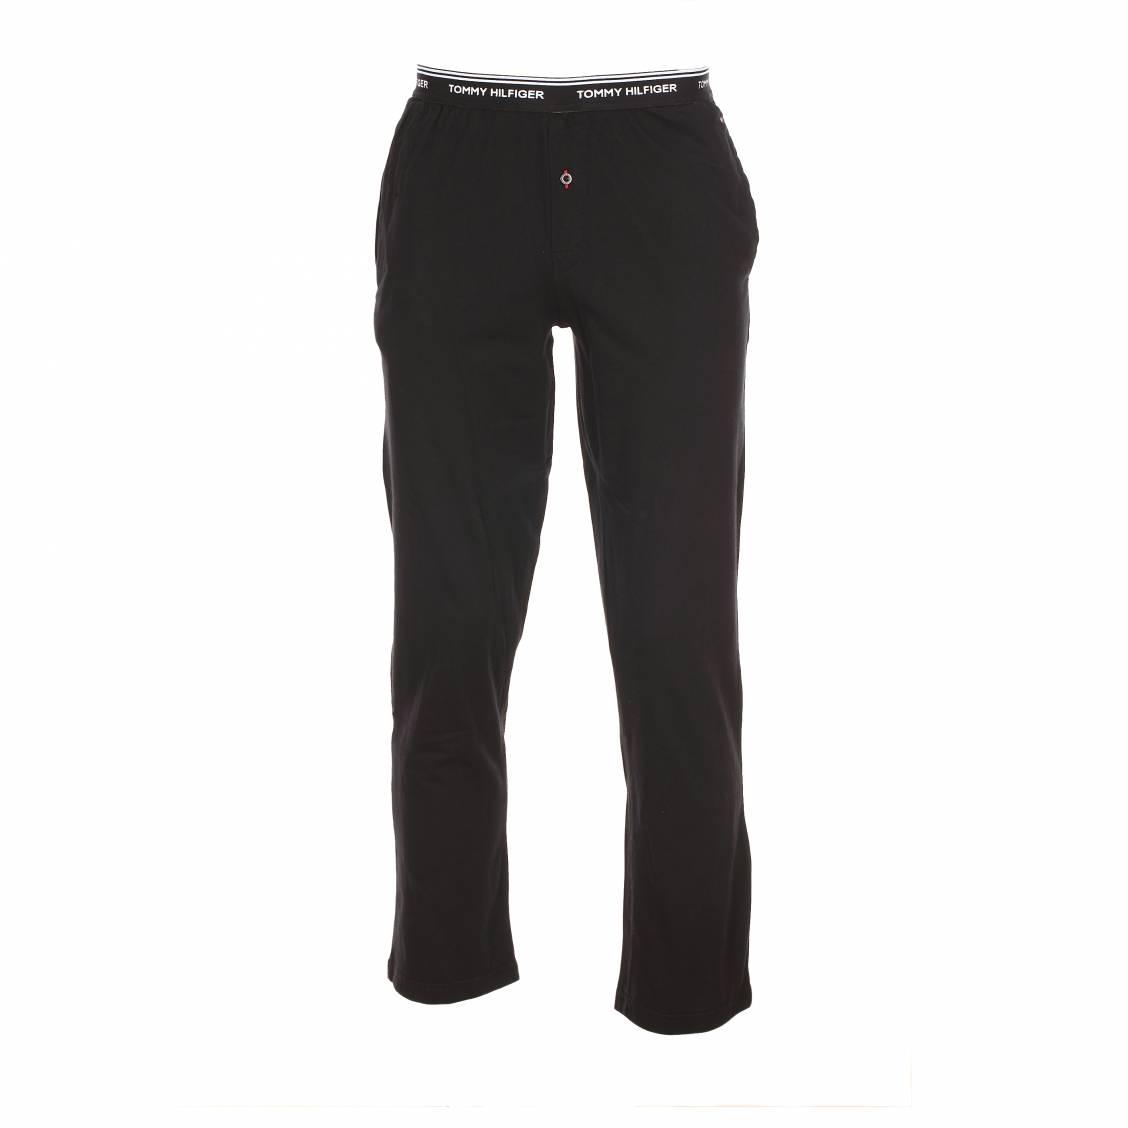 pantalon d 39 int rieur kirk tommy hilfliger en coton noir rue des hommes. Black Bedroom Furniture Sets. Home Design Ideas